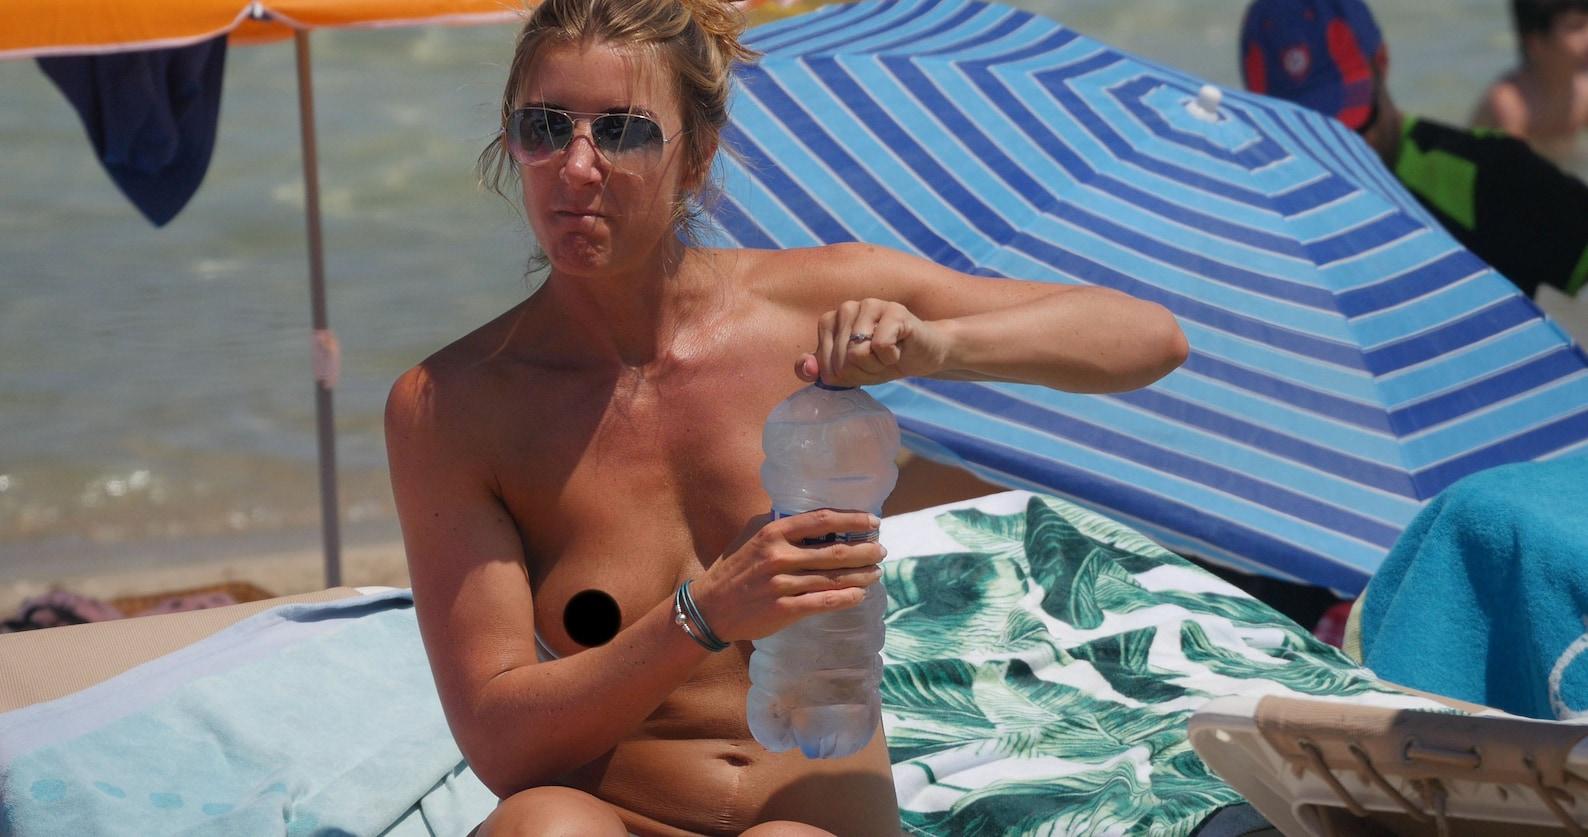 Jennifer aniston topless on beach high quality porn photo